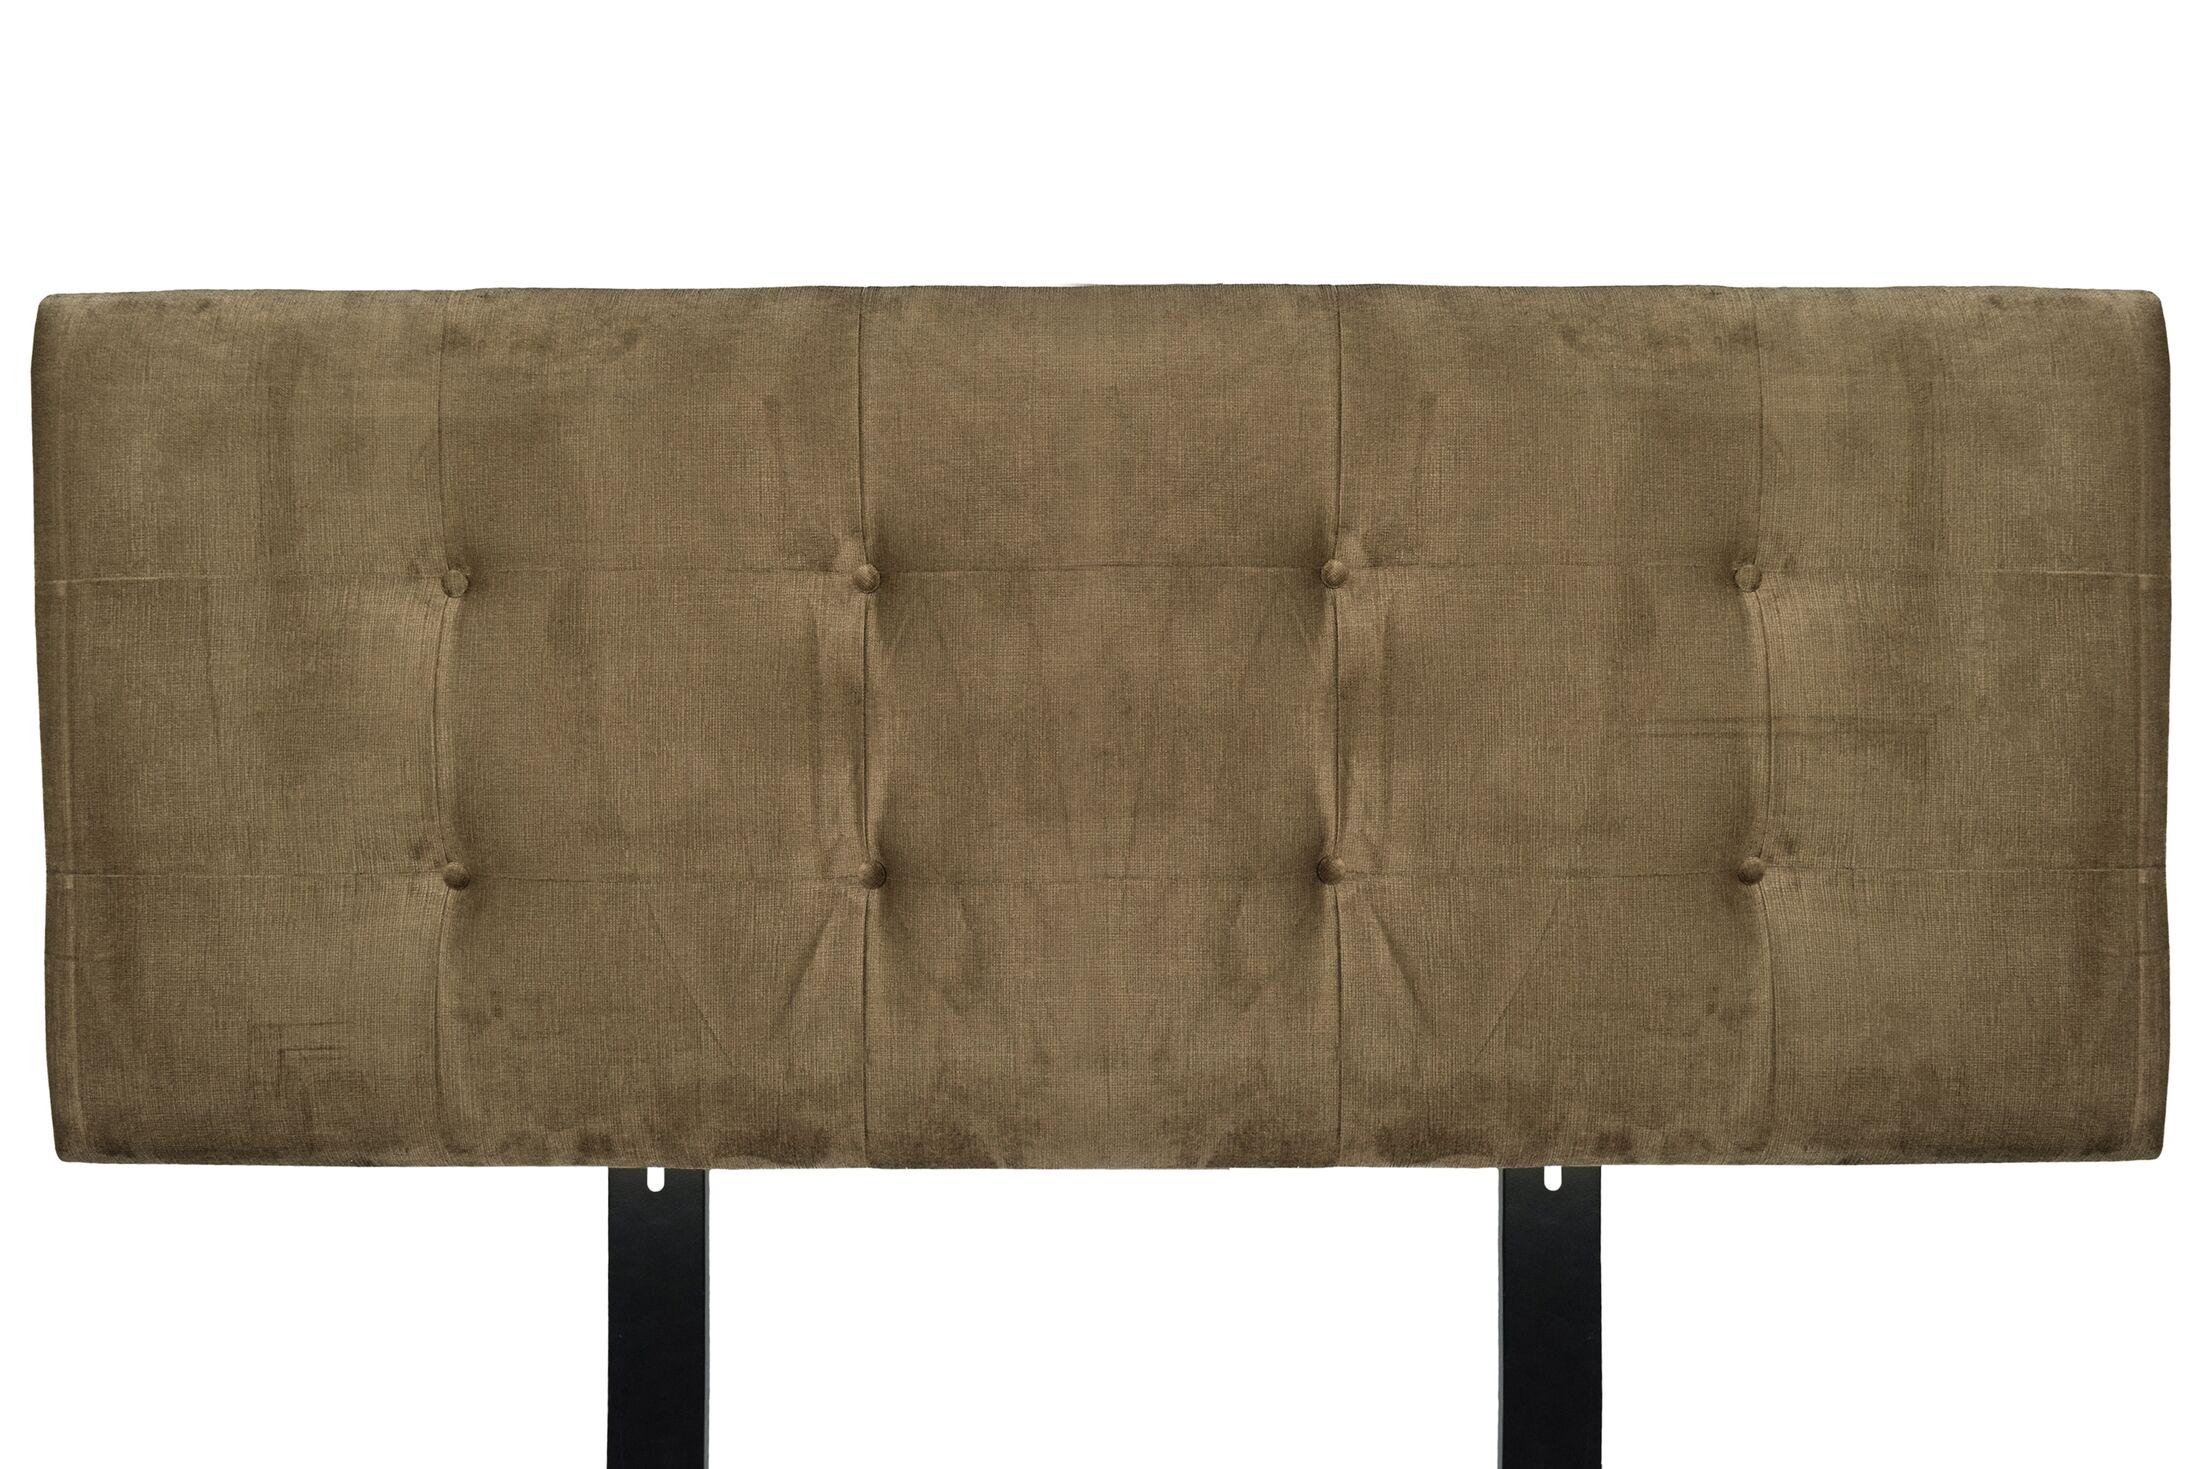 Ennis Upholstered Panel Headboard Size: Full, Upholstery: Coffee